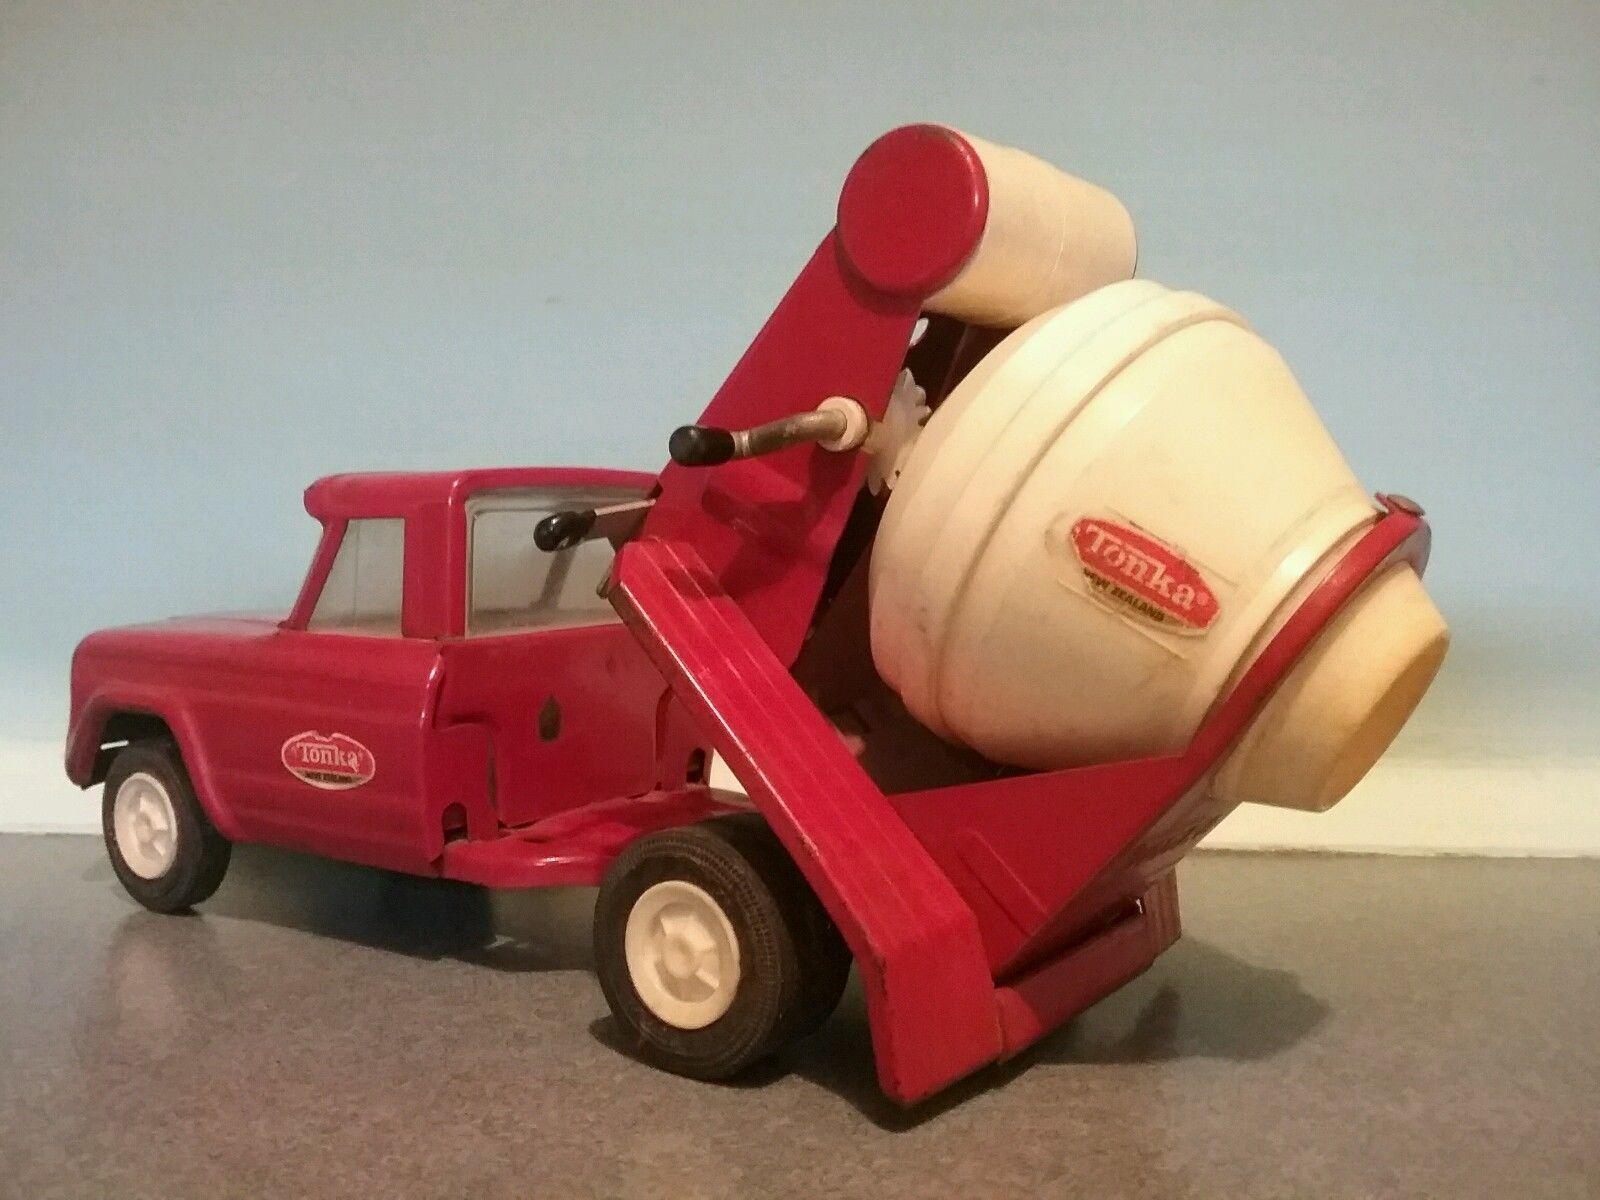 New Zealand 70s Tonka Cement Mixer In Toys Hobbies Diecast Vehicles Cars Trucks Vans Ebay Tonka Toys Diecast Cars Diecast